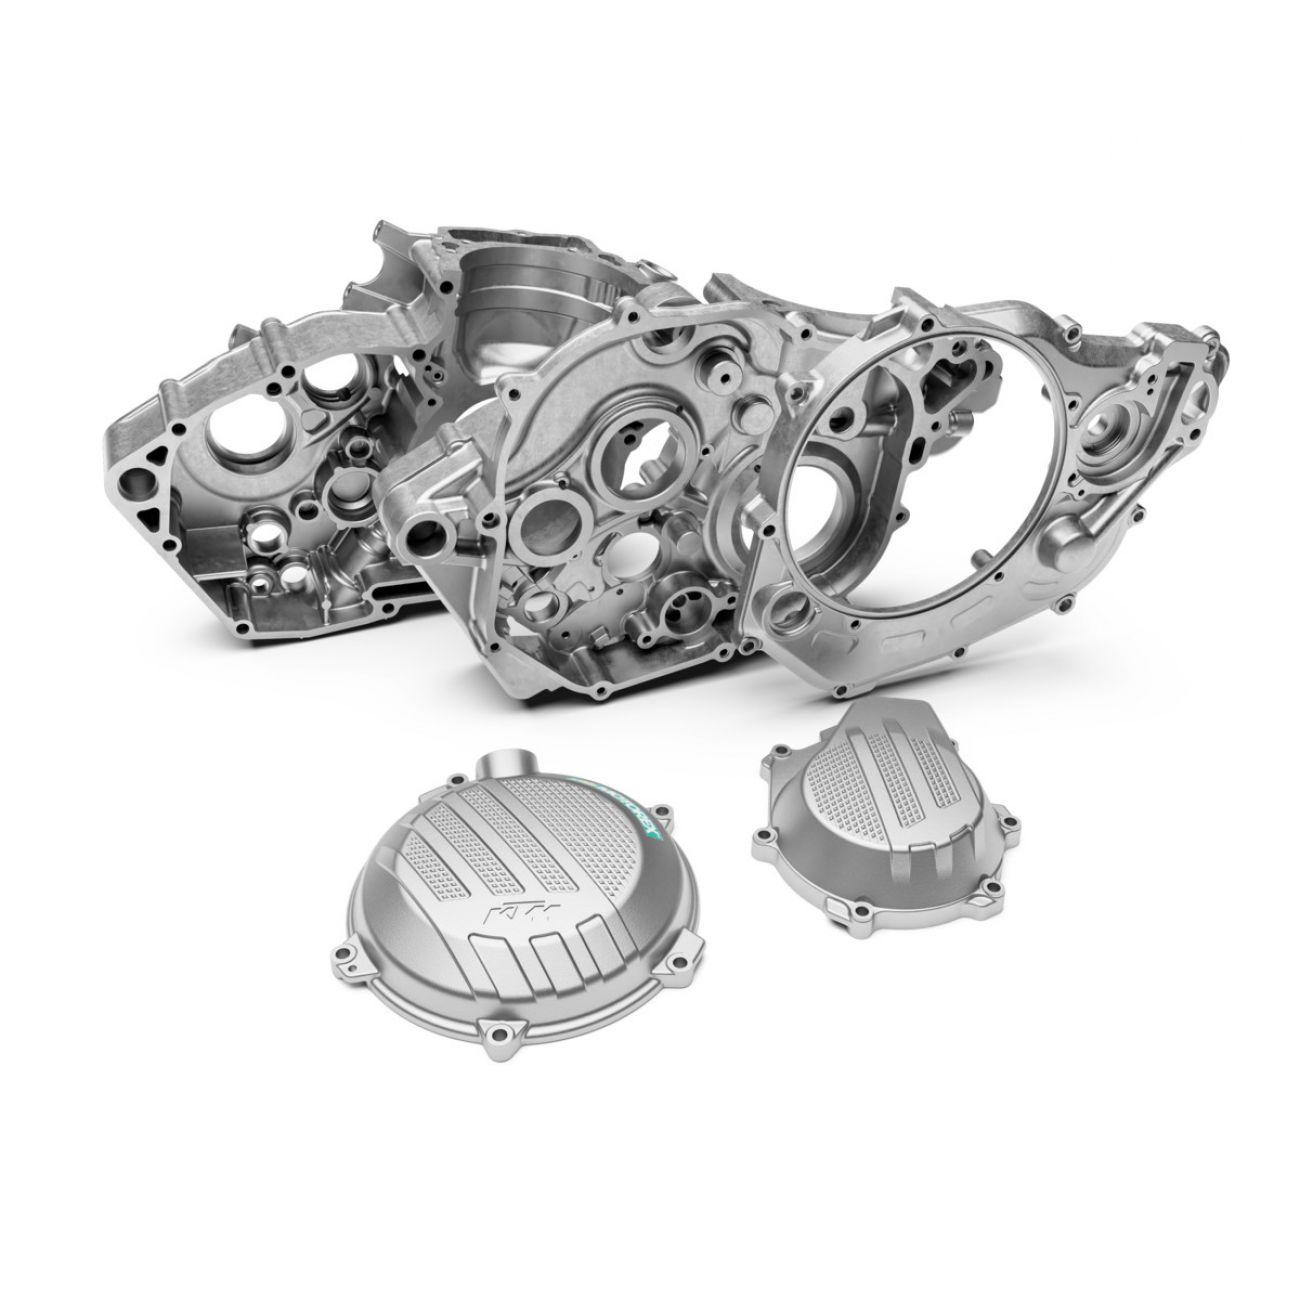 MOTORCYCLES KTM MOTOCROSS MY20 2020_450SXF MODEL_MY19-20_450SXF_CASES_NP